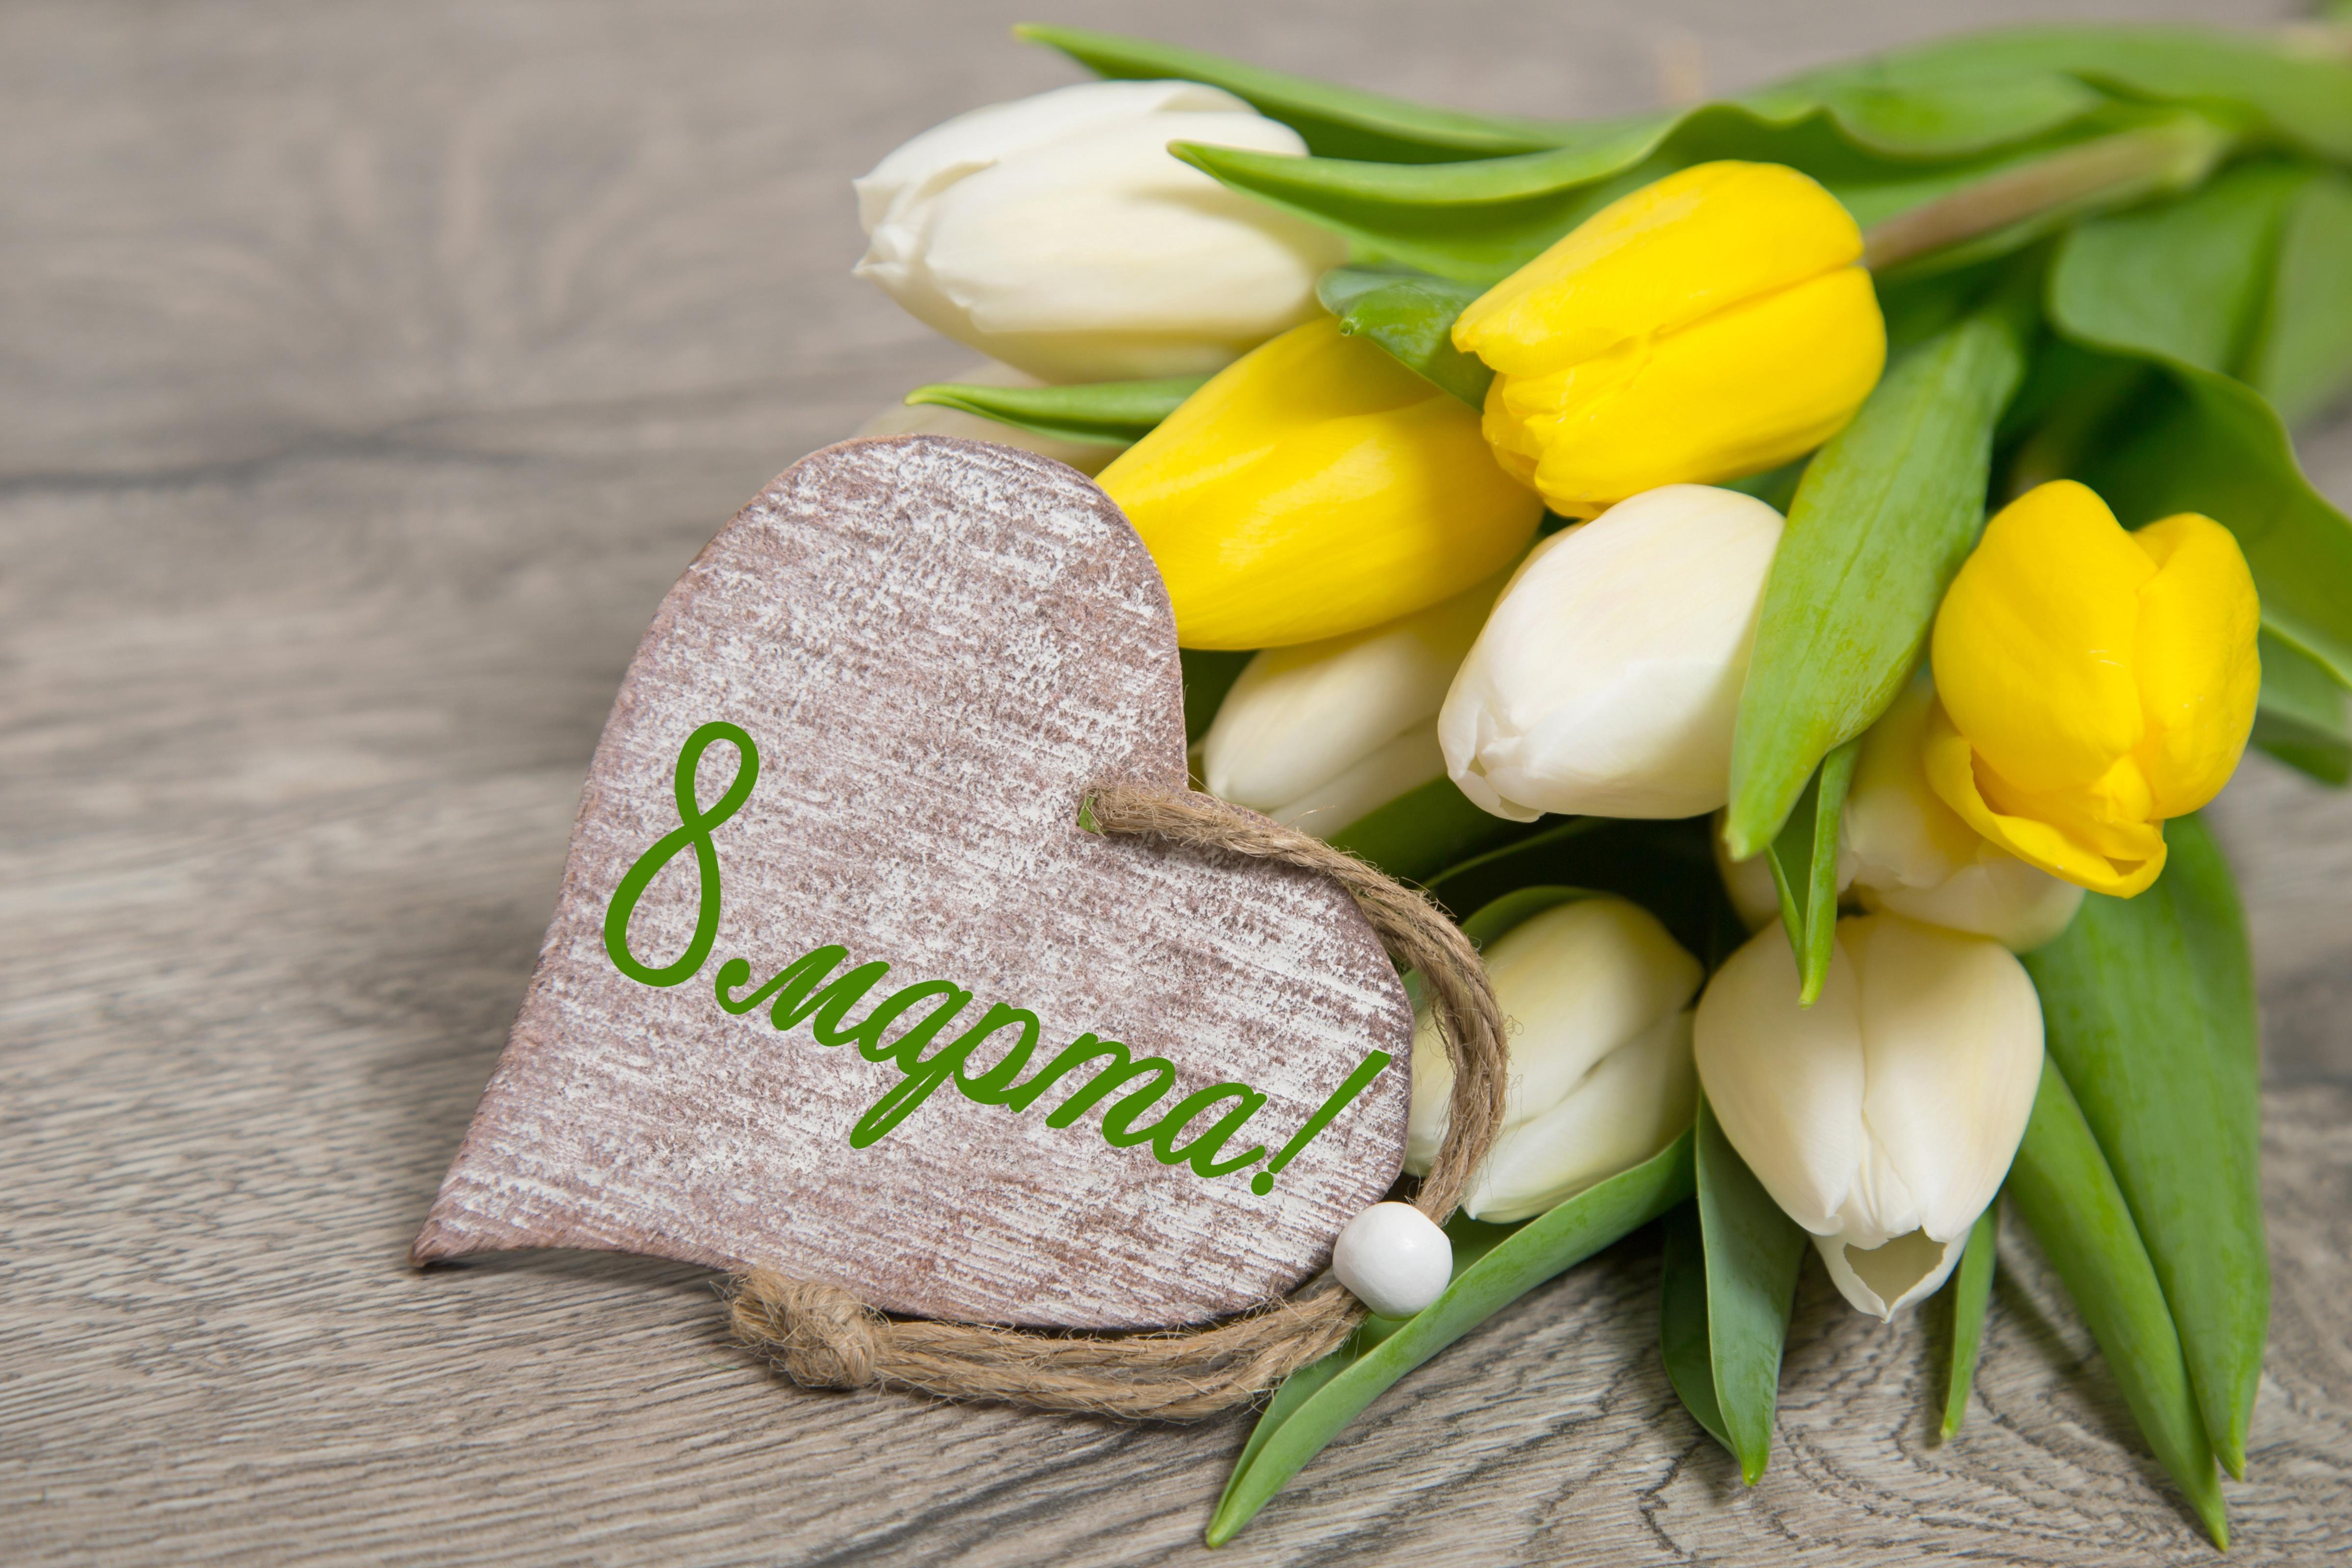 фото открытки 8 марта с тюльпанами фото никто